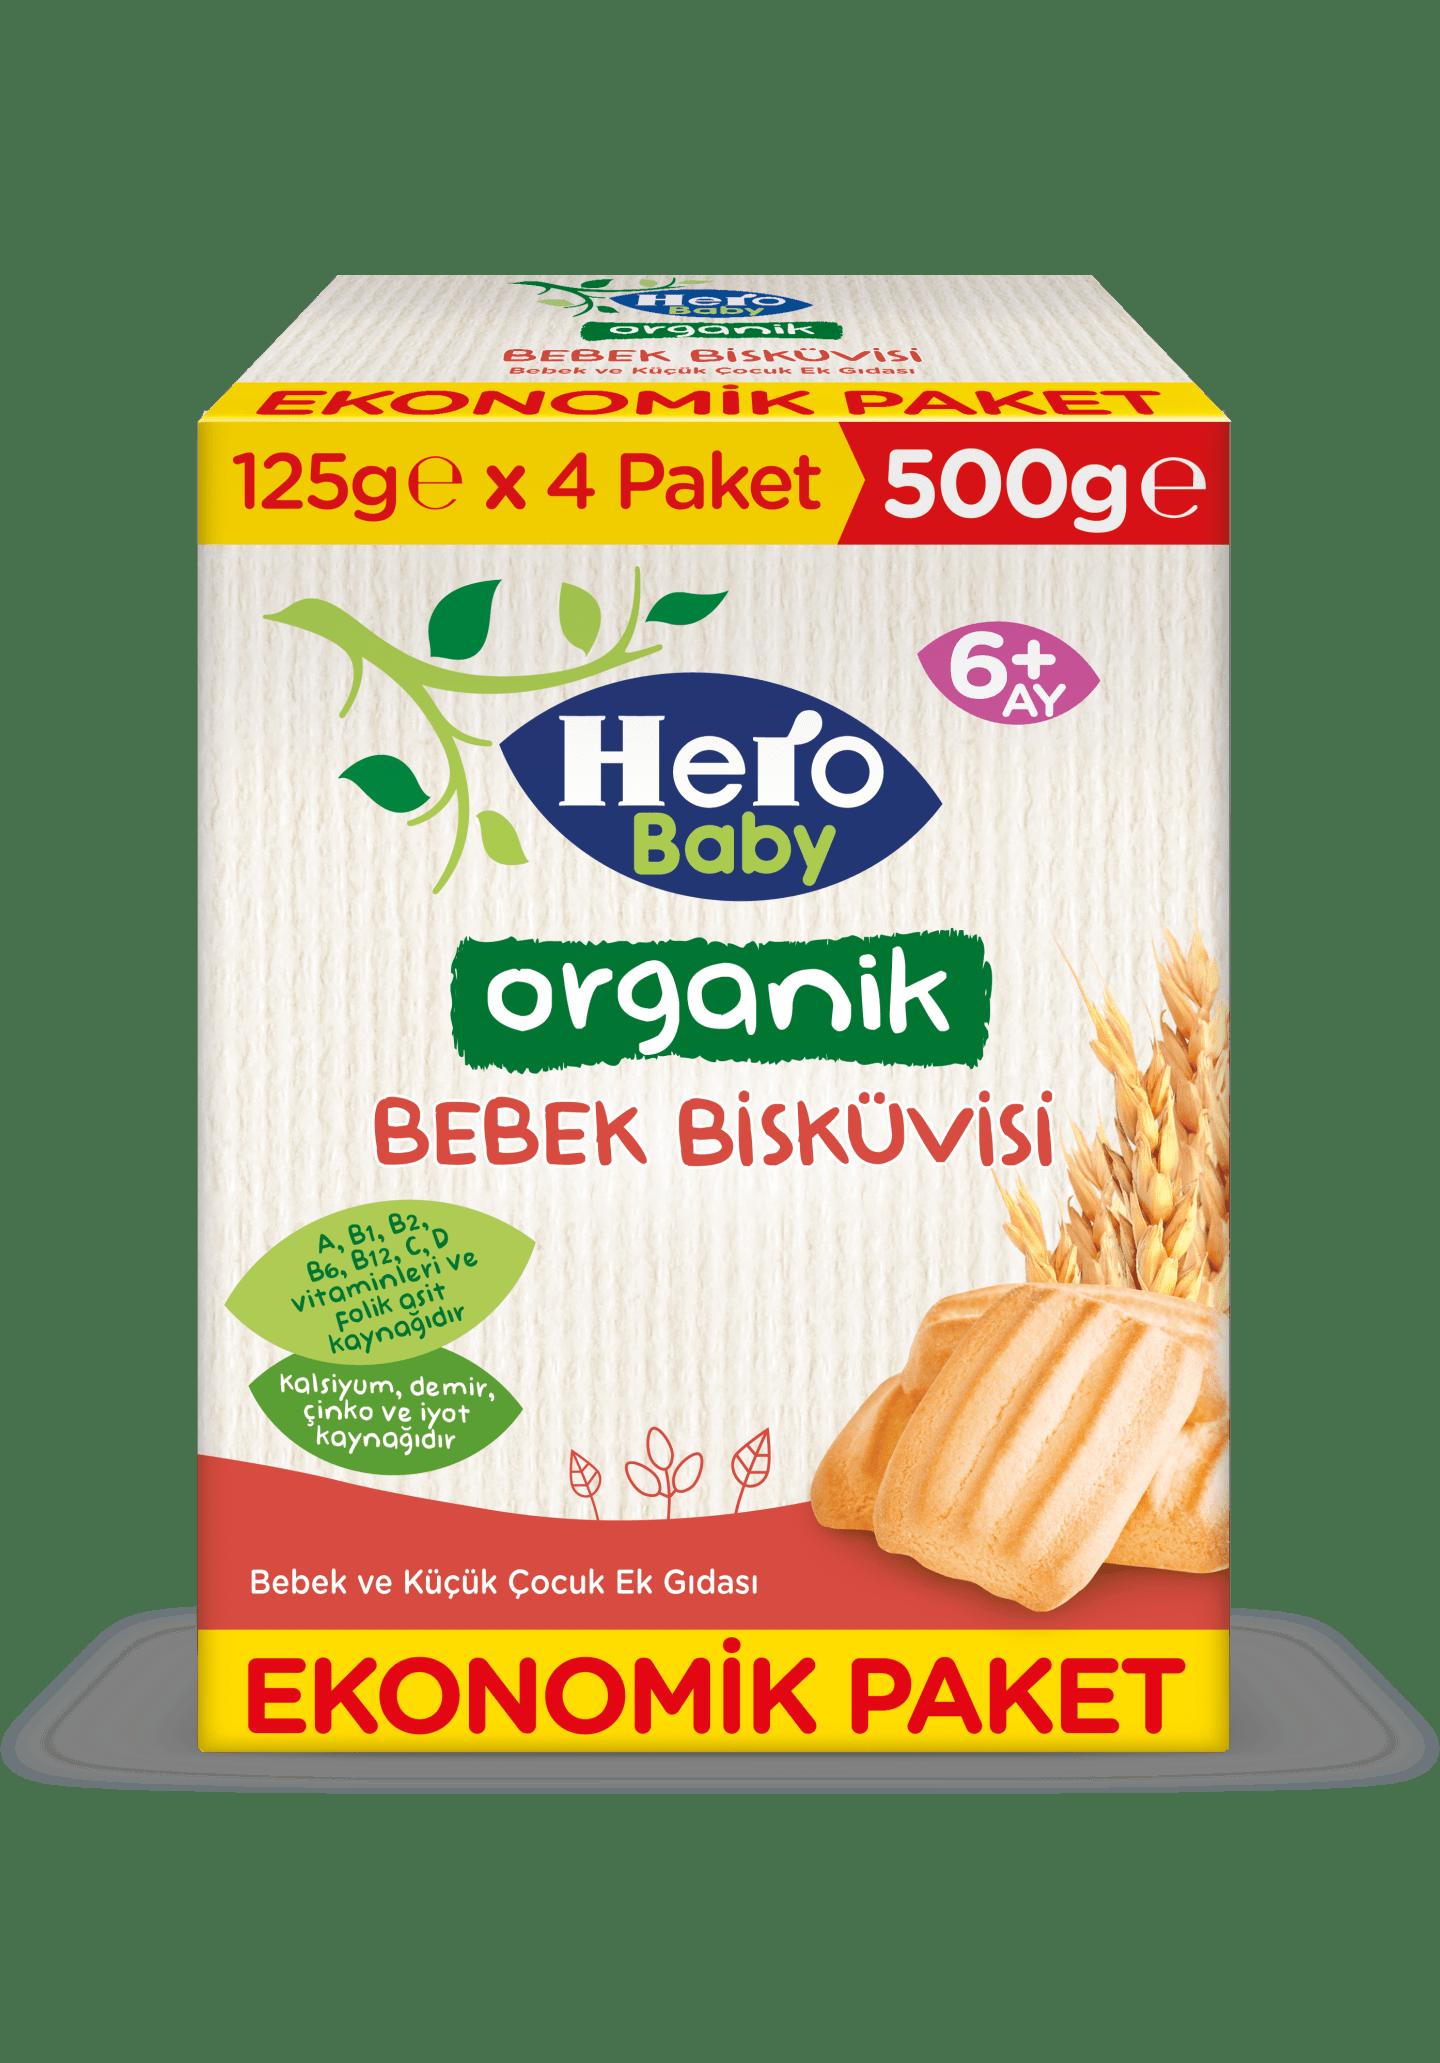 Organik Bebek Bisküvisi 500g